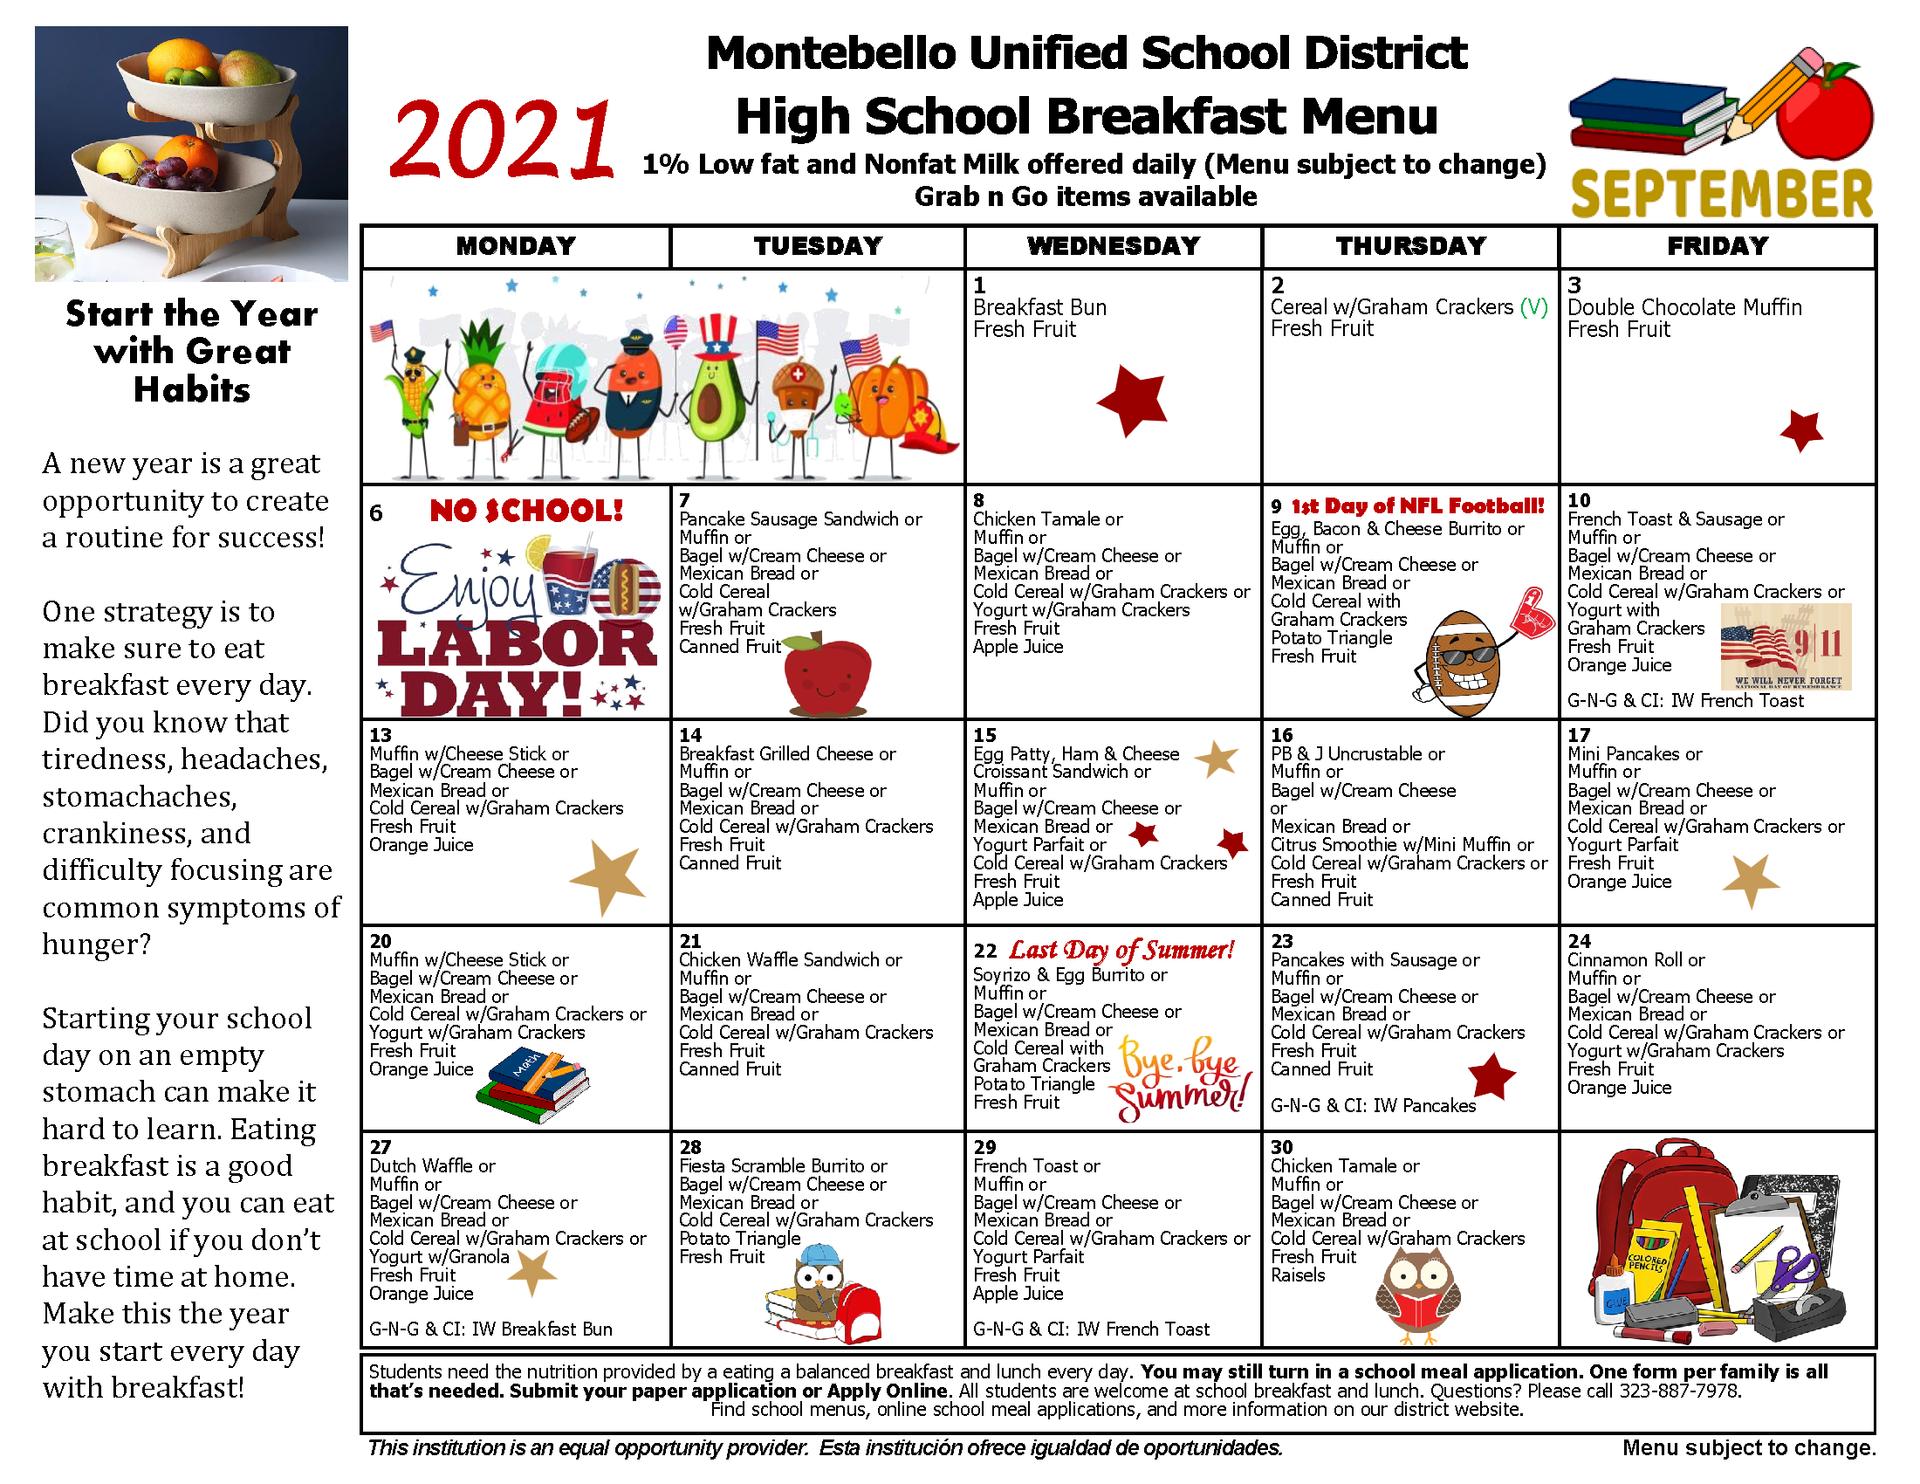 High School Breakfast Menu September 2021